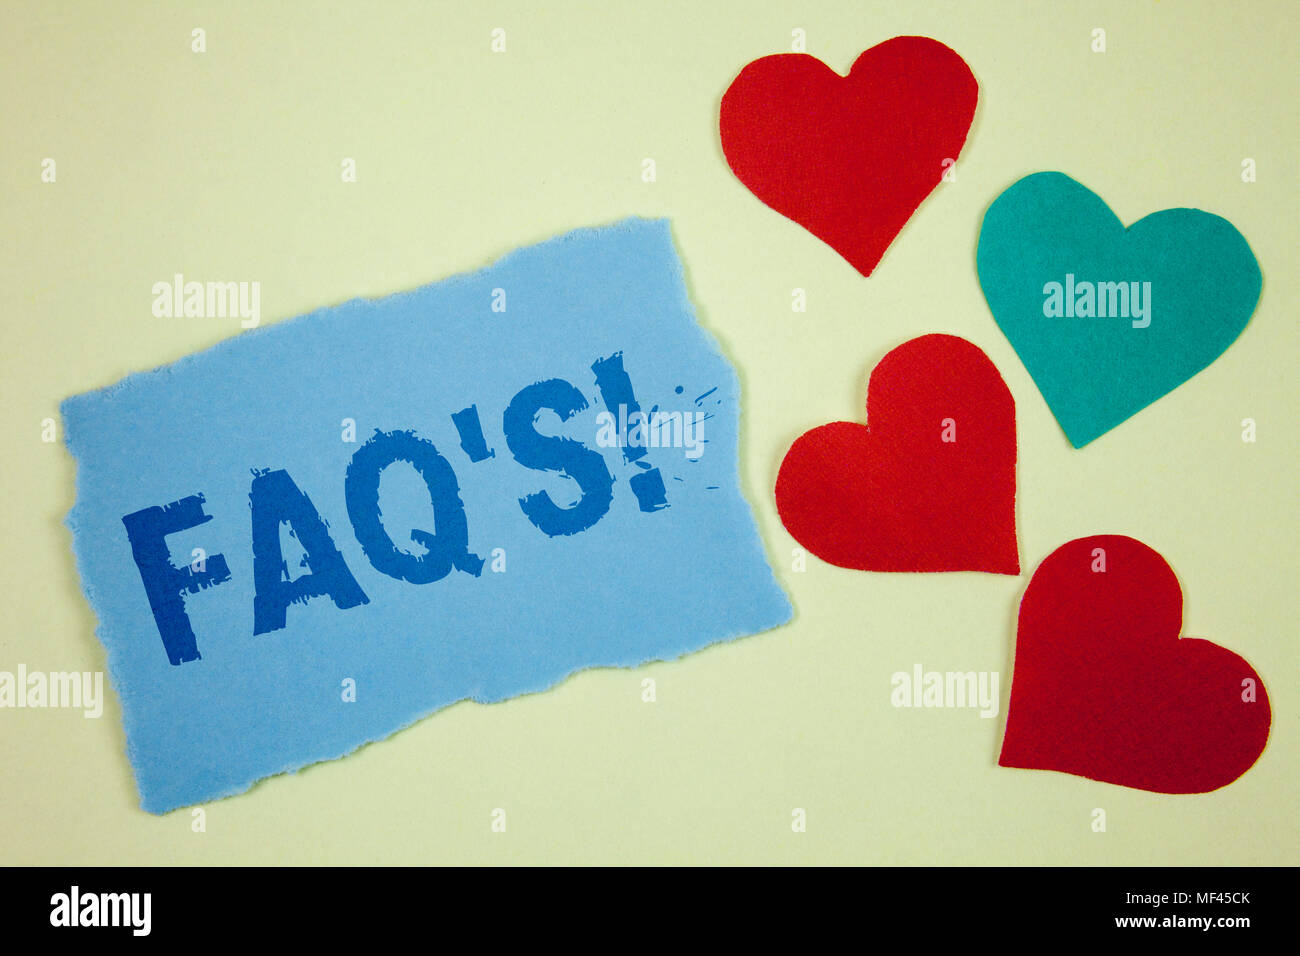 Questions Answered Imágenes De Stock & Questions Answered Fotos De ...